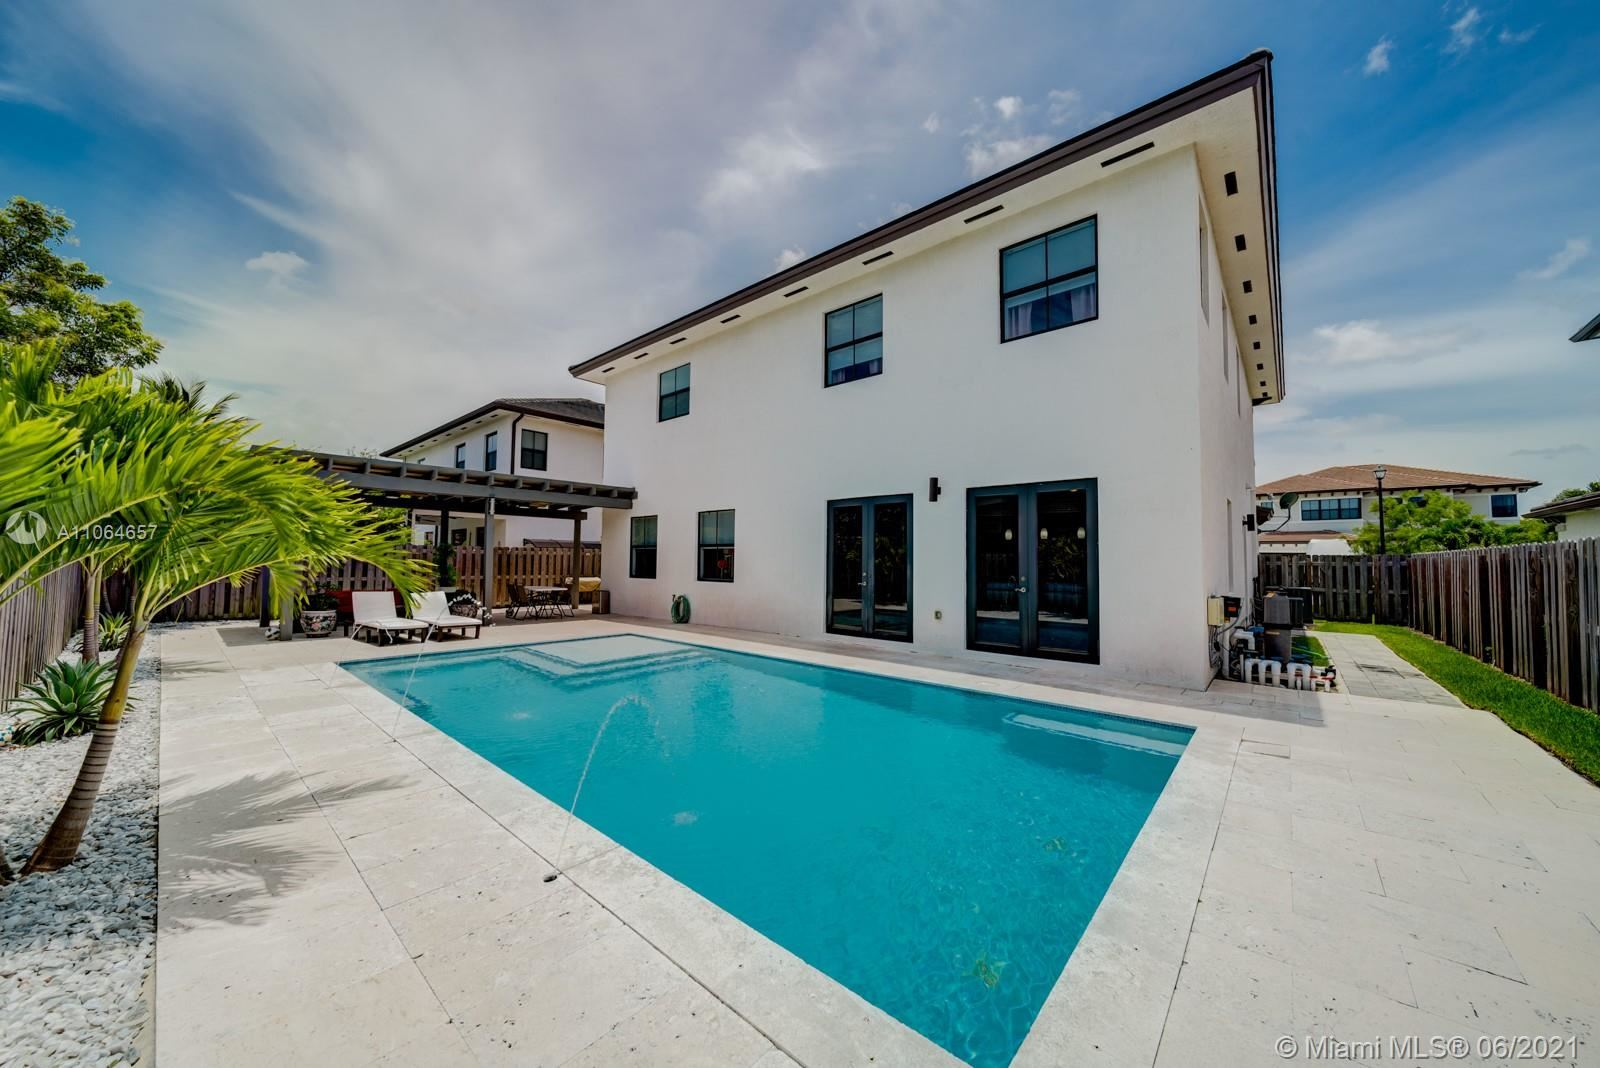 7365 SW 163rd Pl, Miami, FL 33193 - #: A11064657